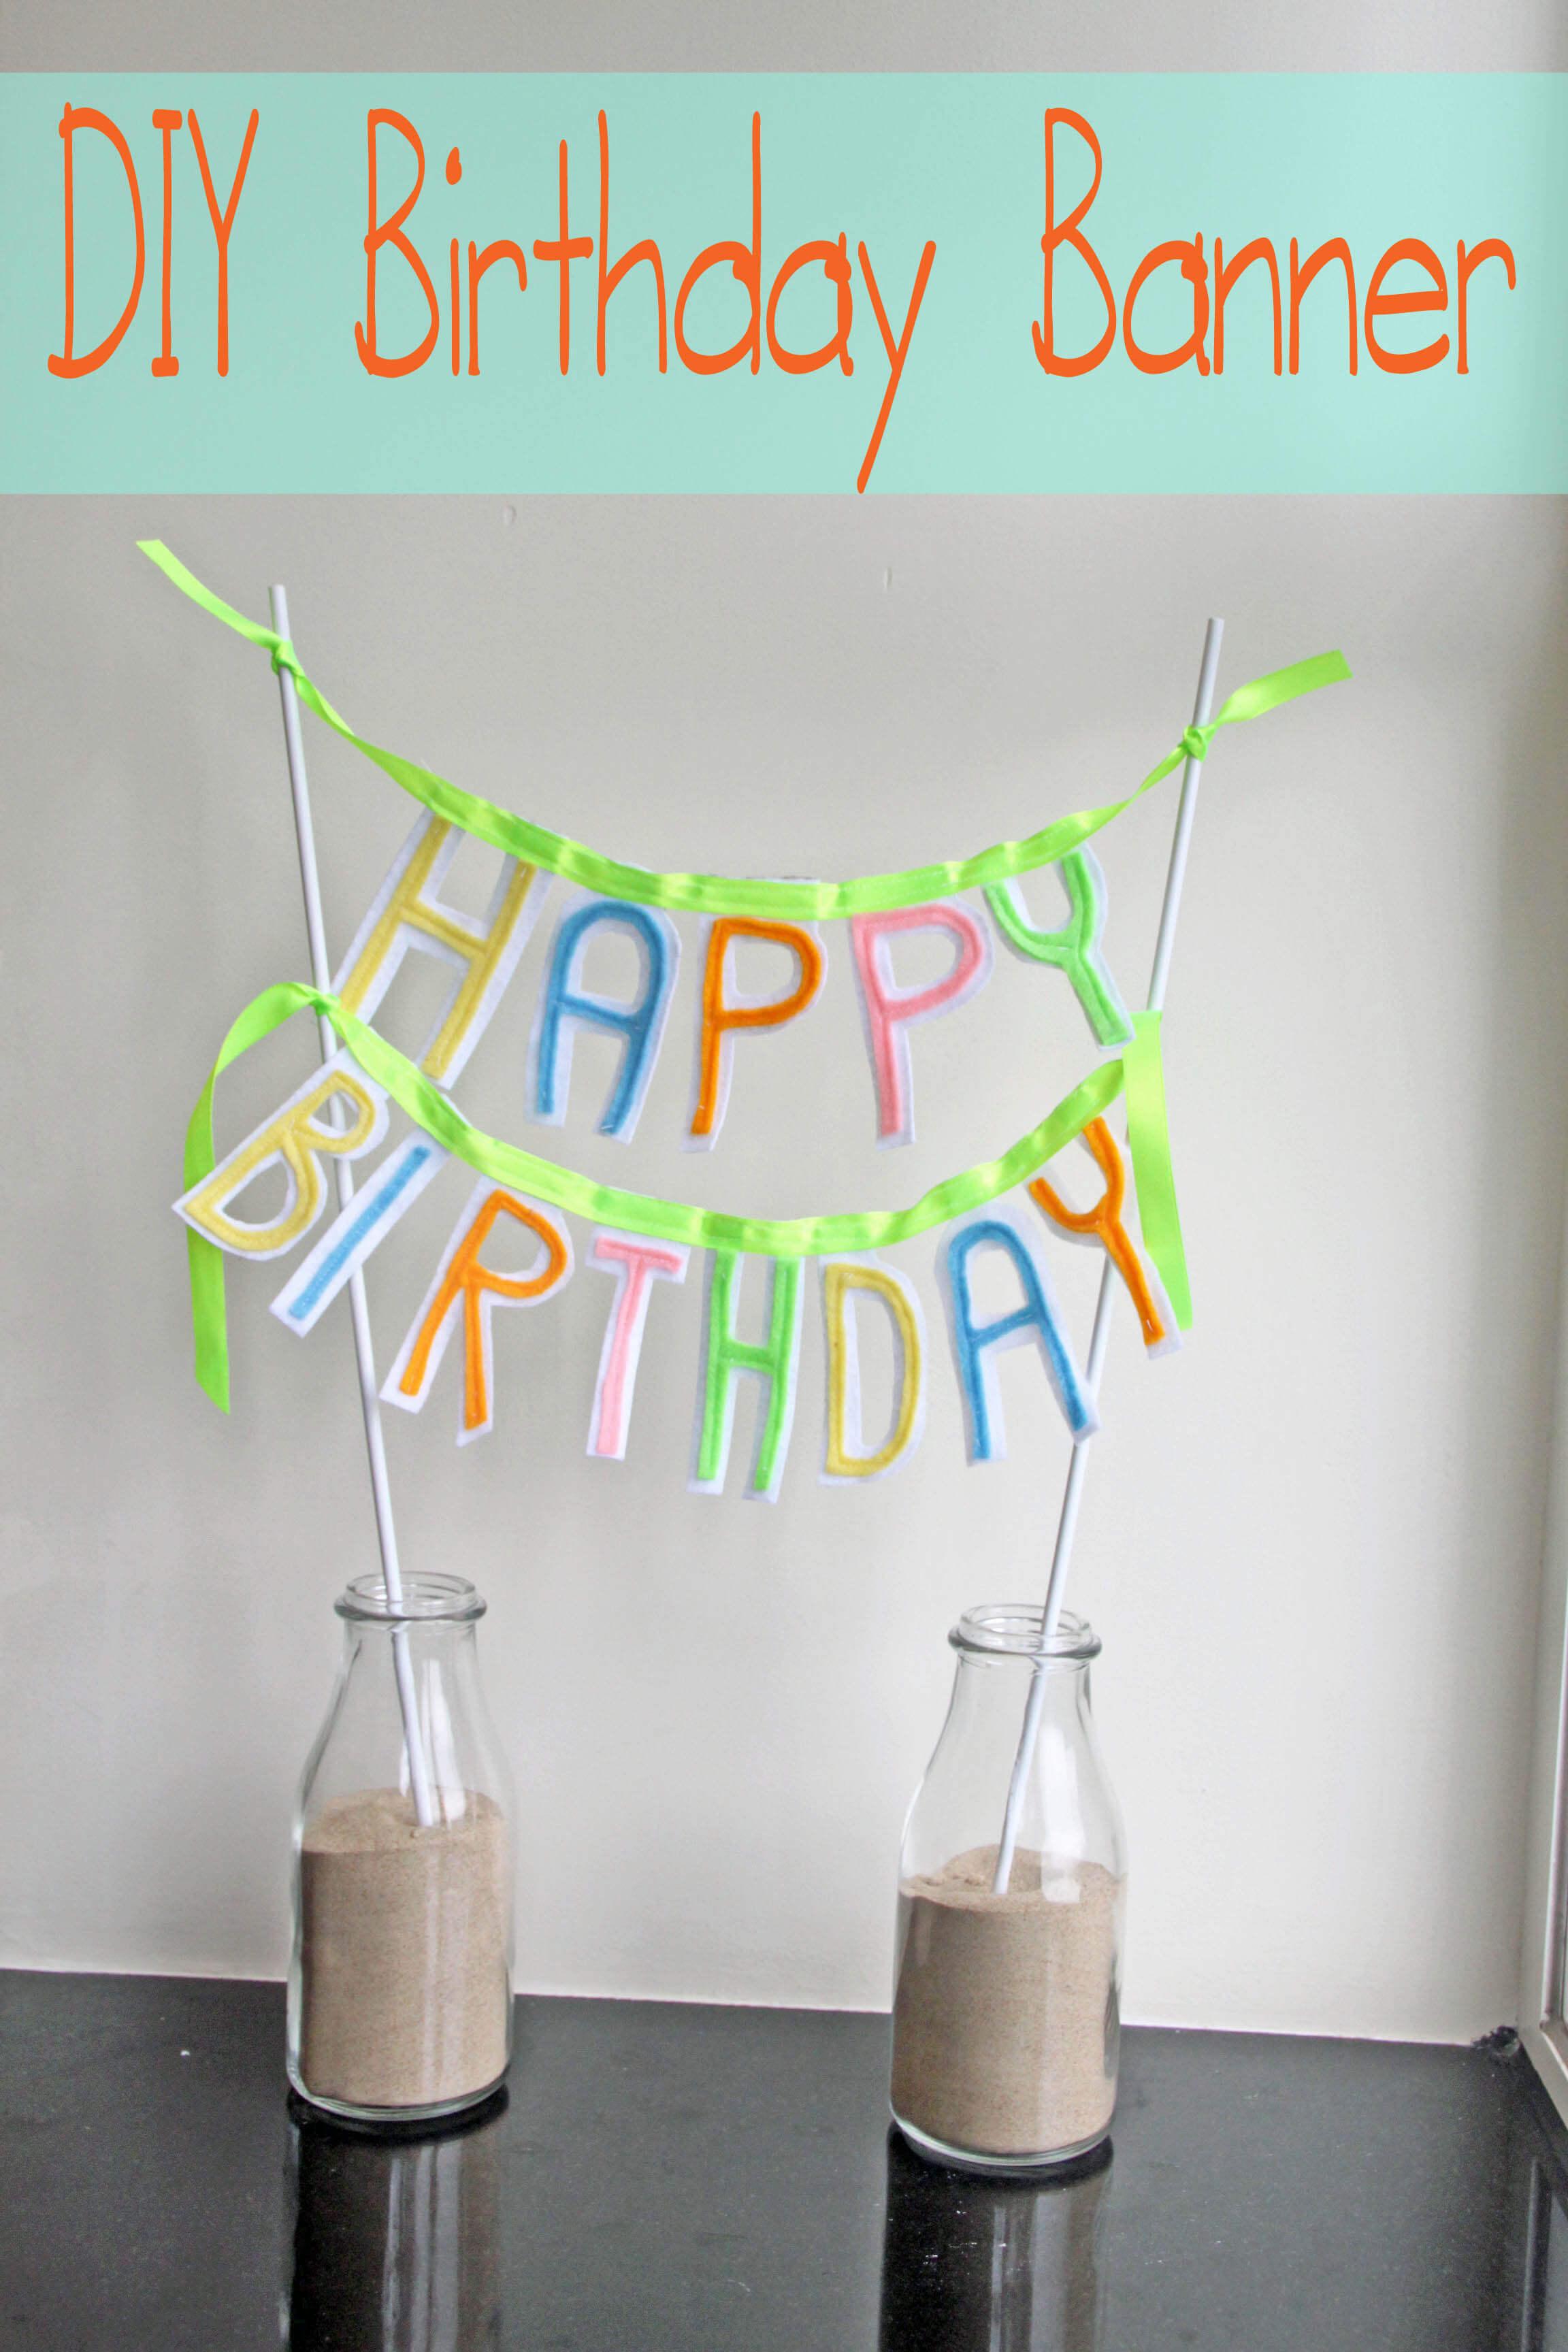 Felt Birthday Banner - Nap-time Creations